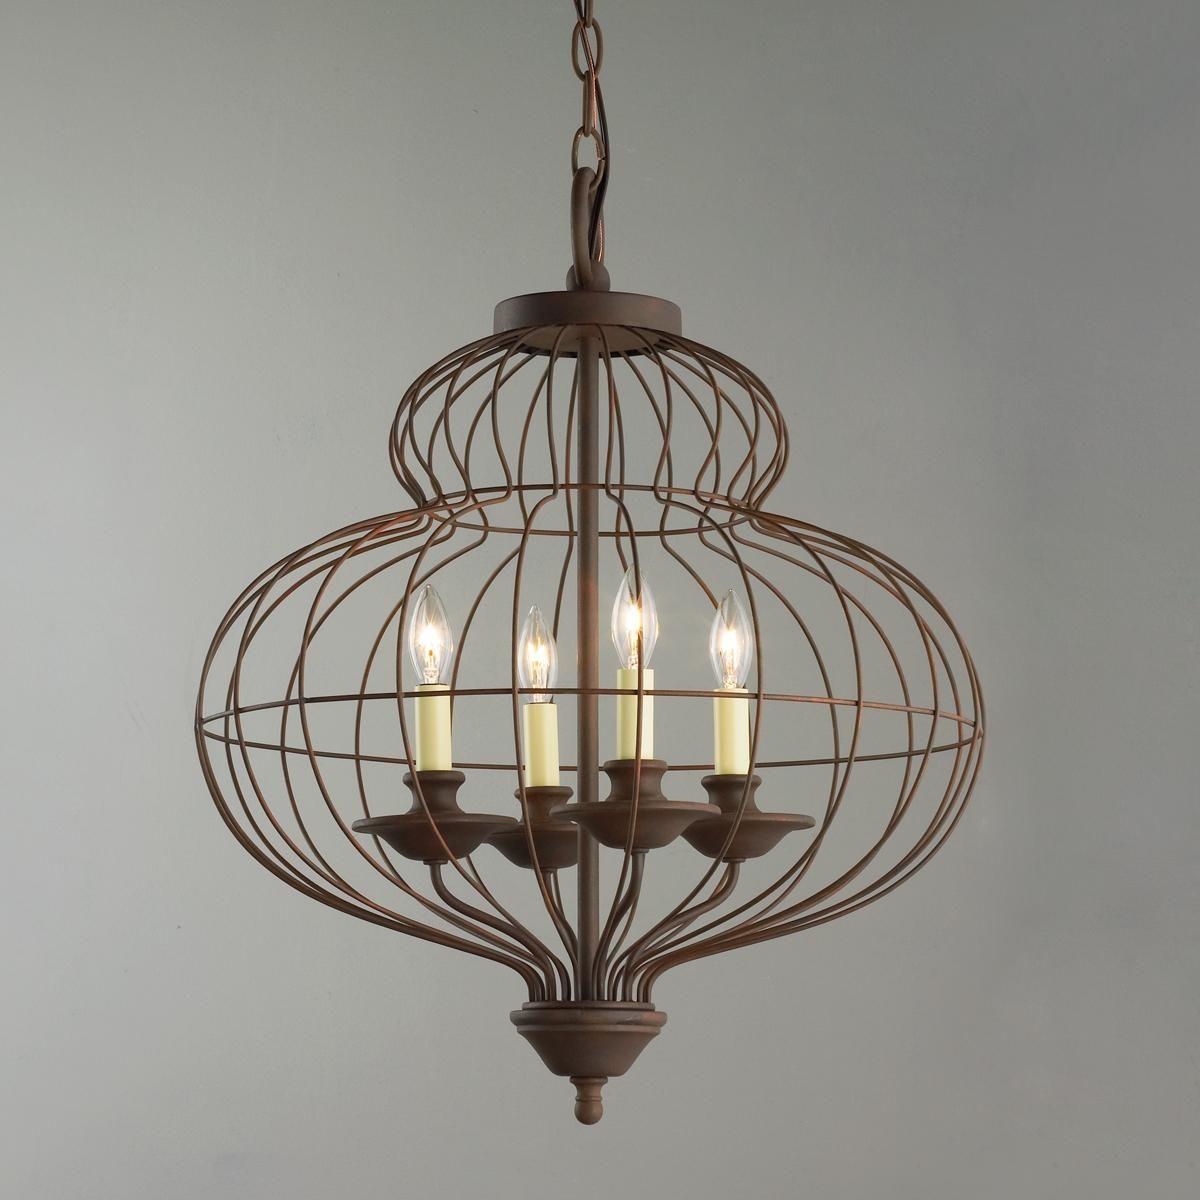 mini chandelier for bathroom. Wire Urn Mini Chandelier For Bathroom L